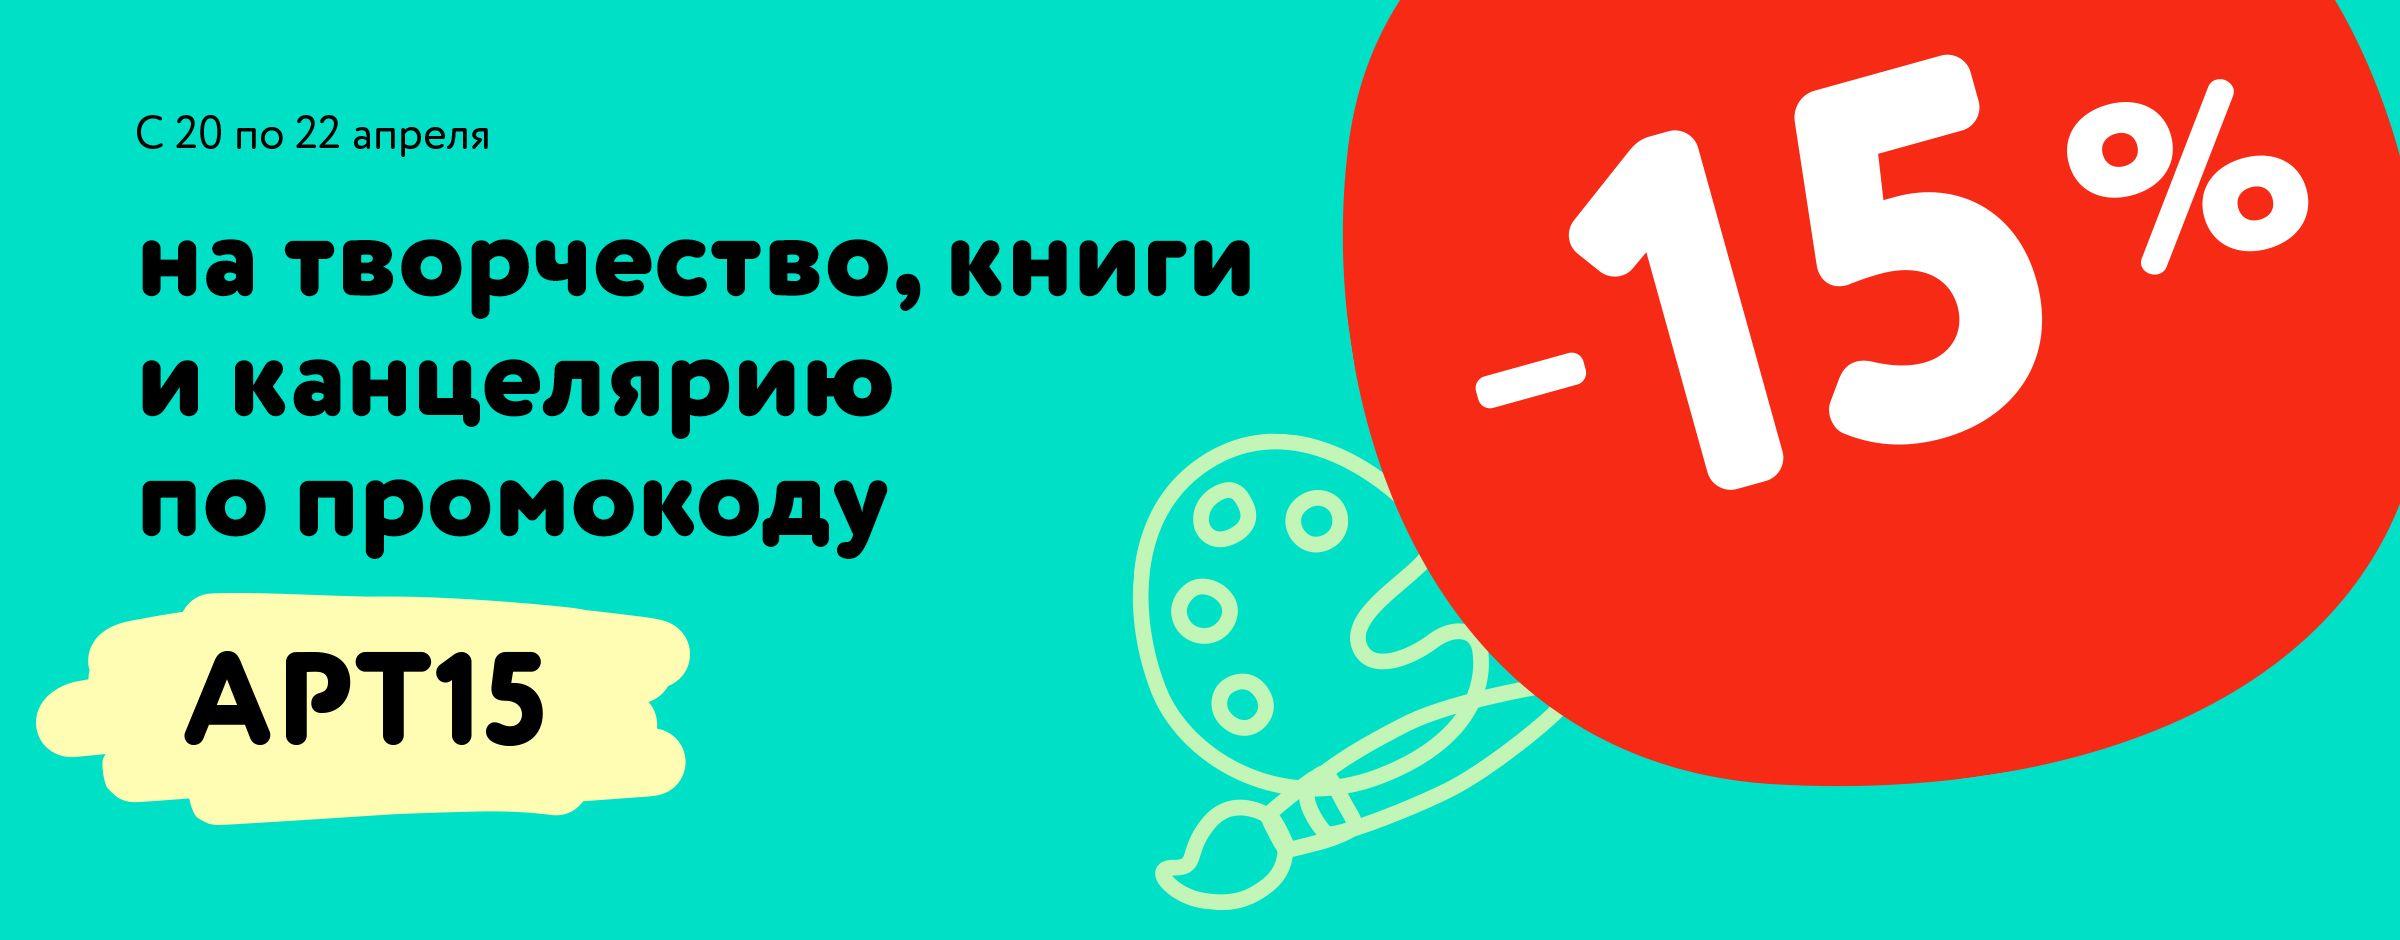 Доп. скидка 15% на творчество, канцелярию и книги по промокоду